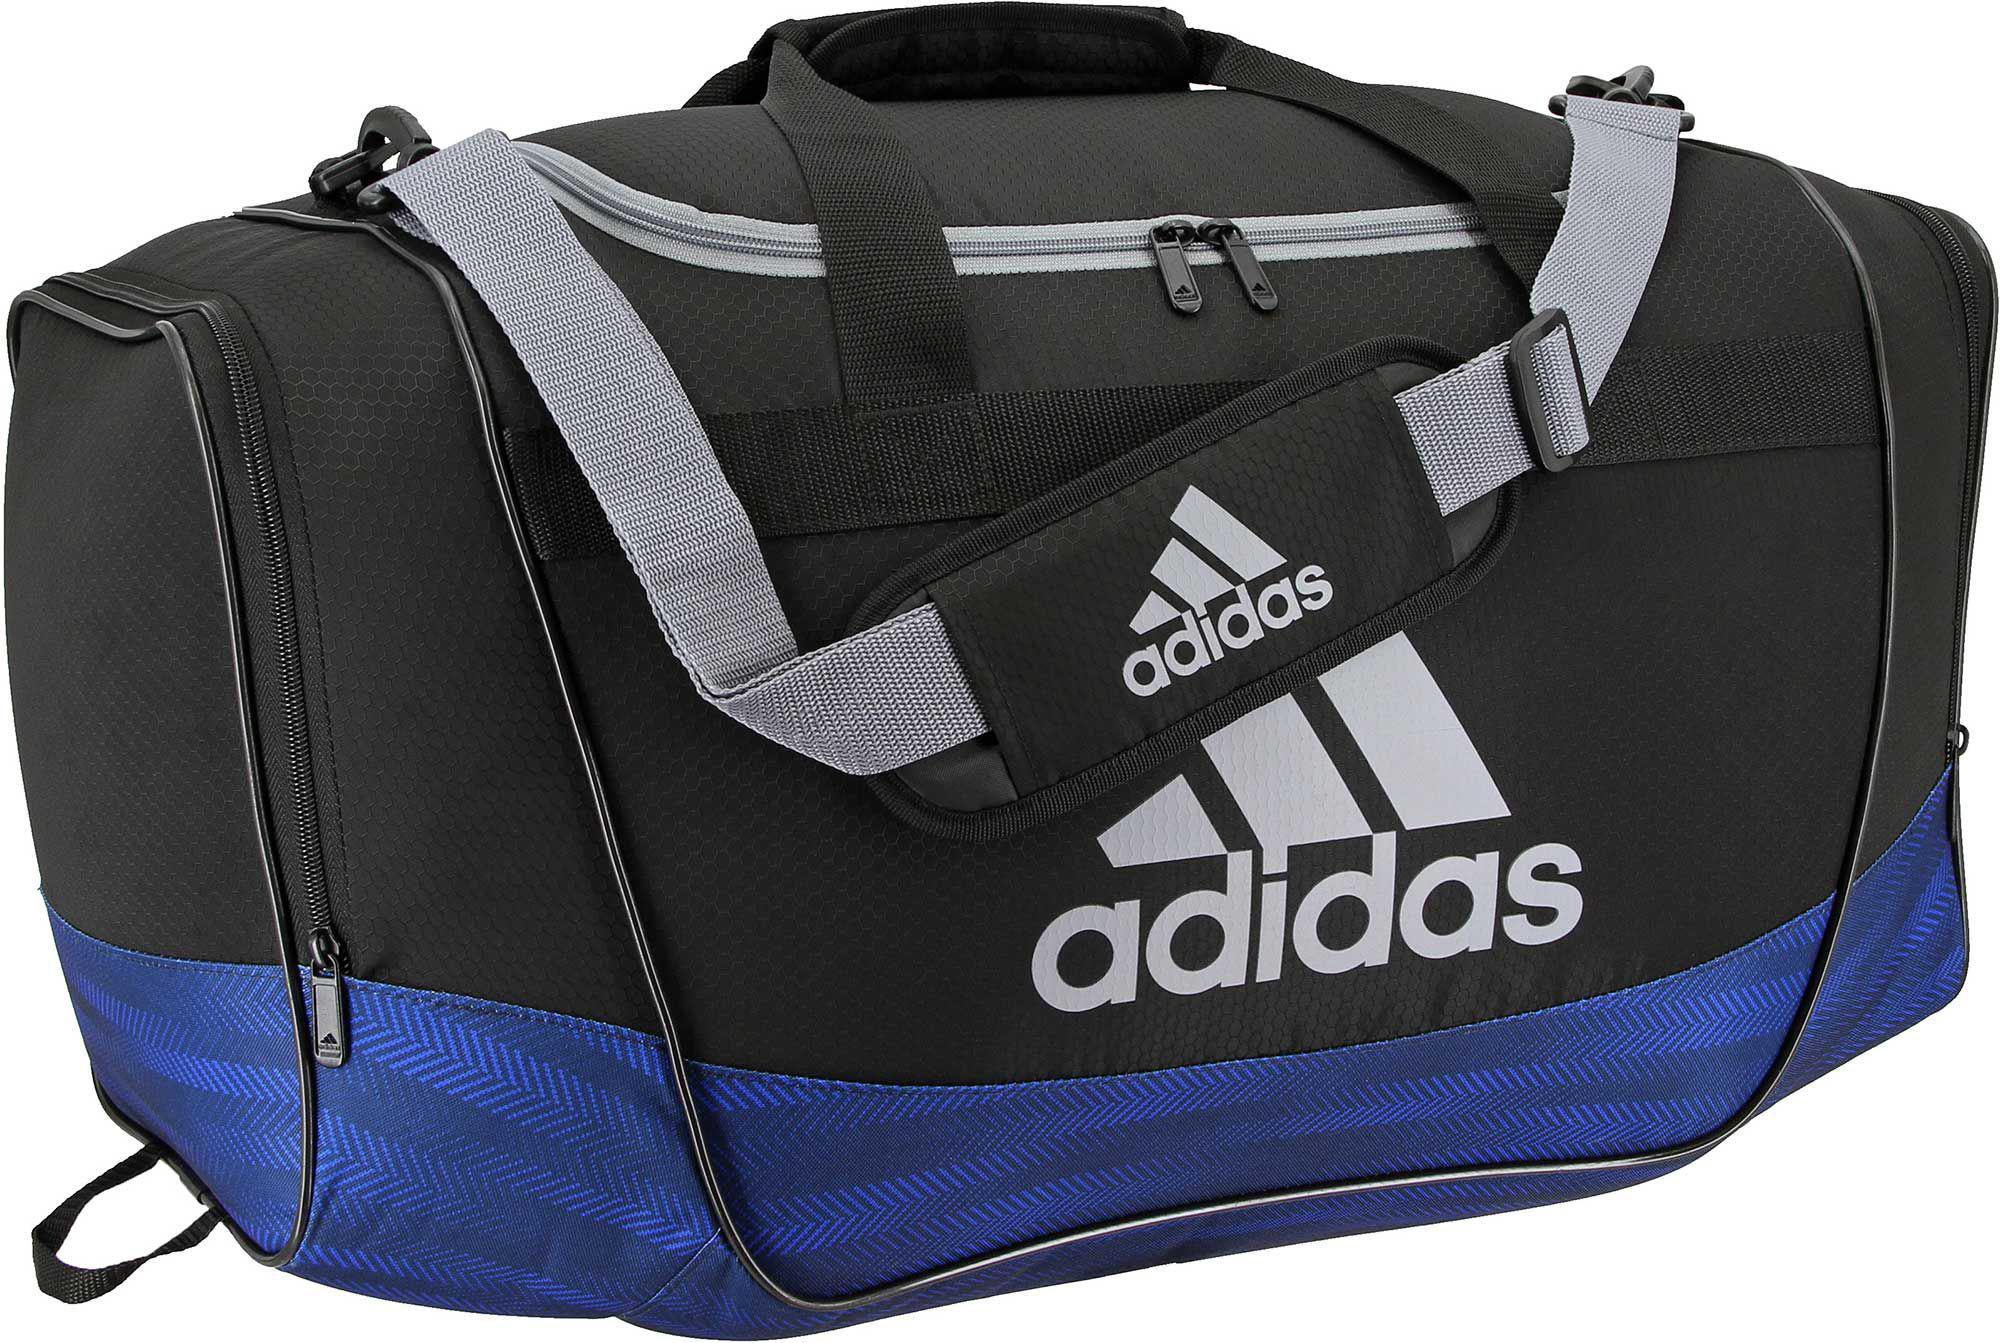 Lyst - adidas Defender Medium Duffle Bag in Black for Men 2999c471a9a52